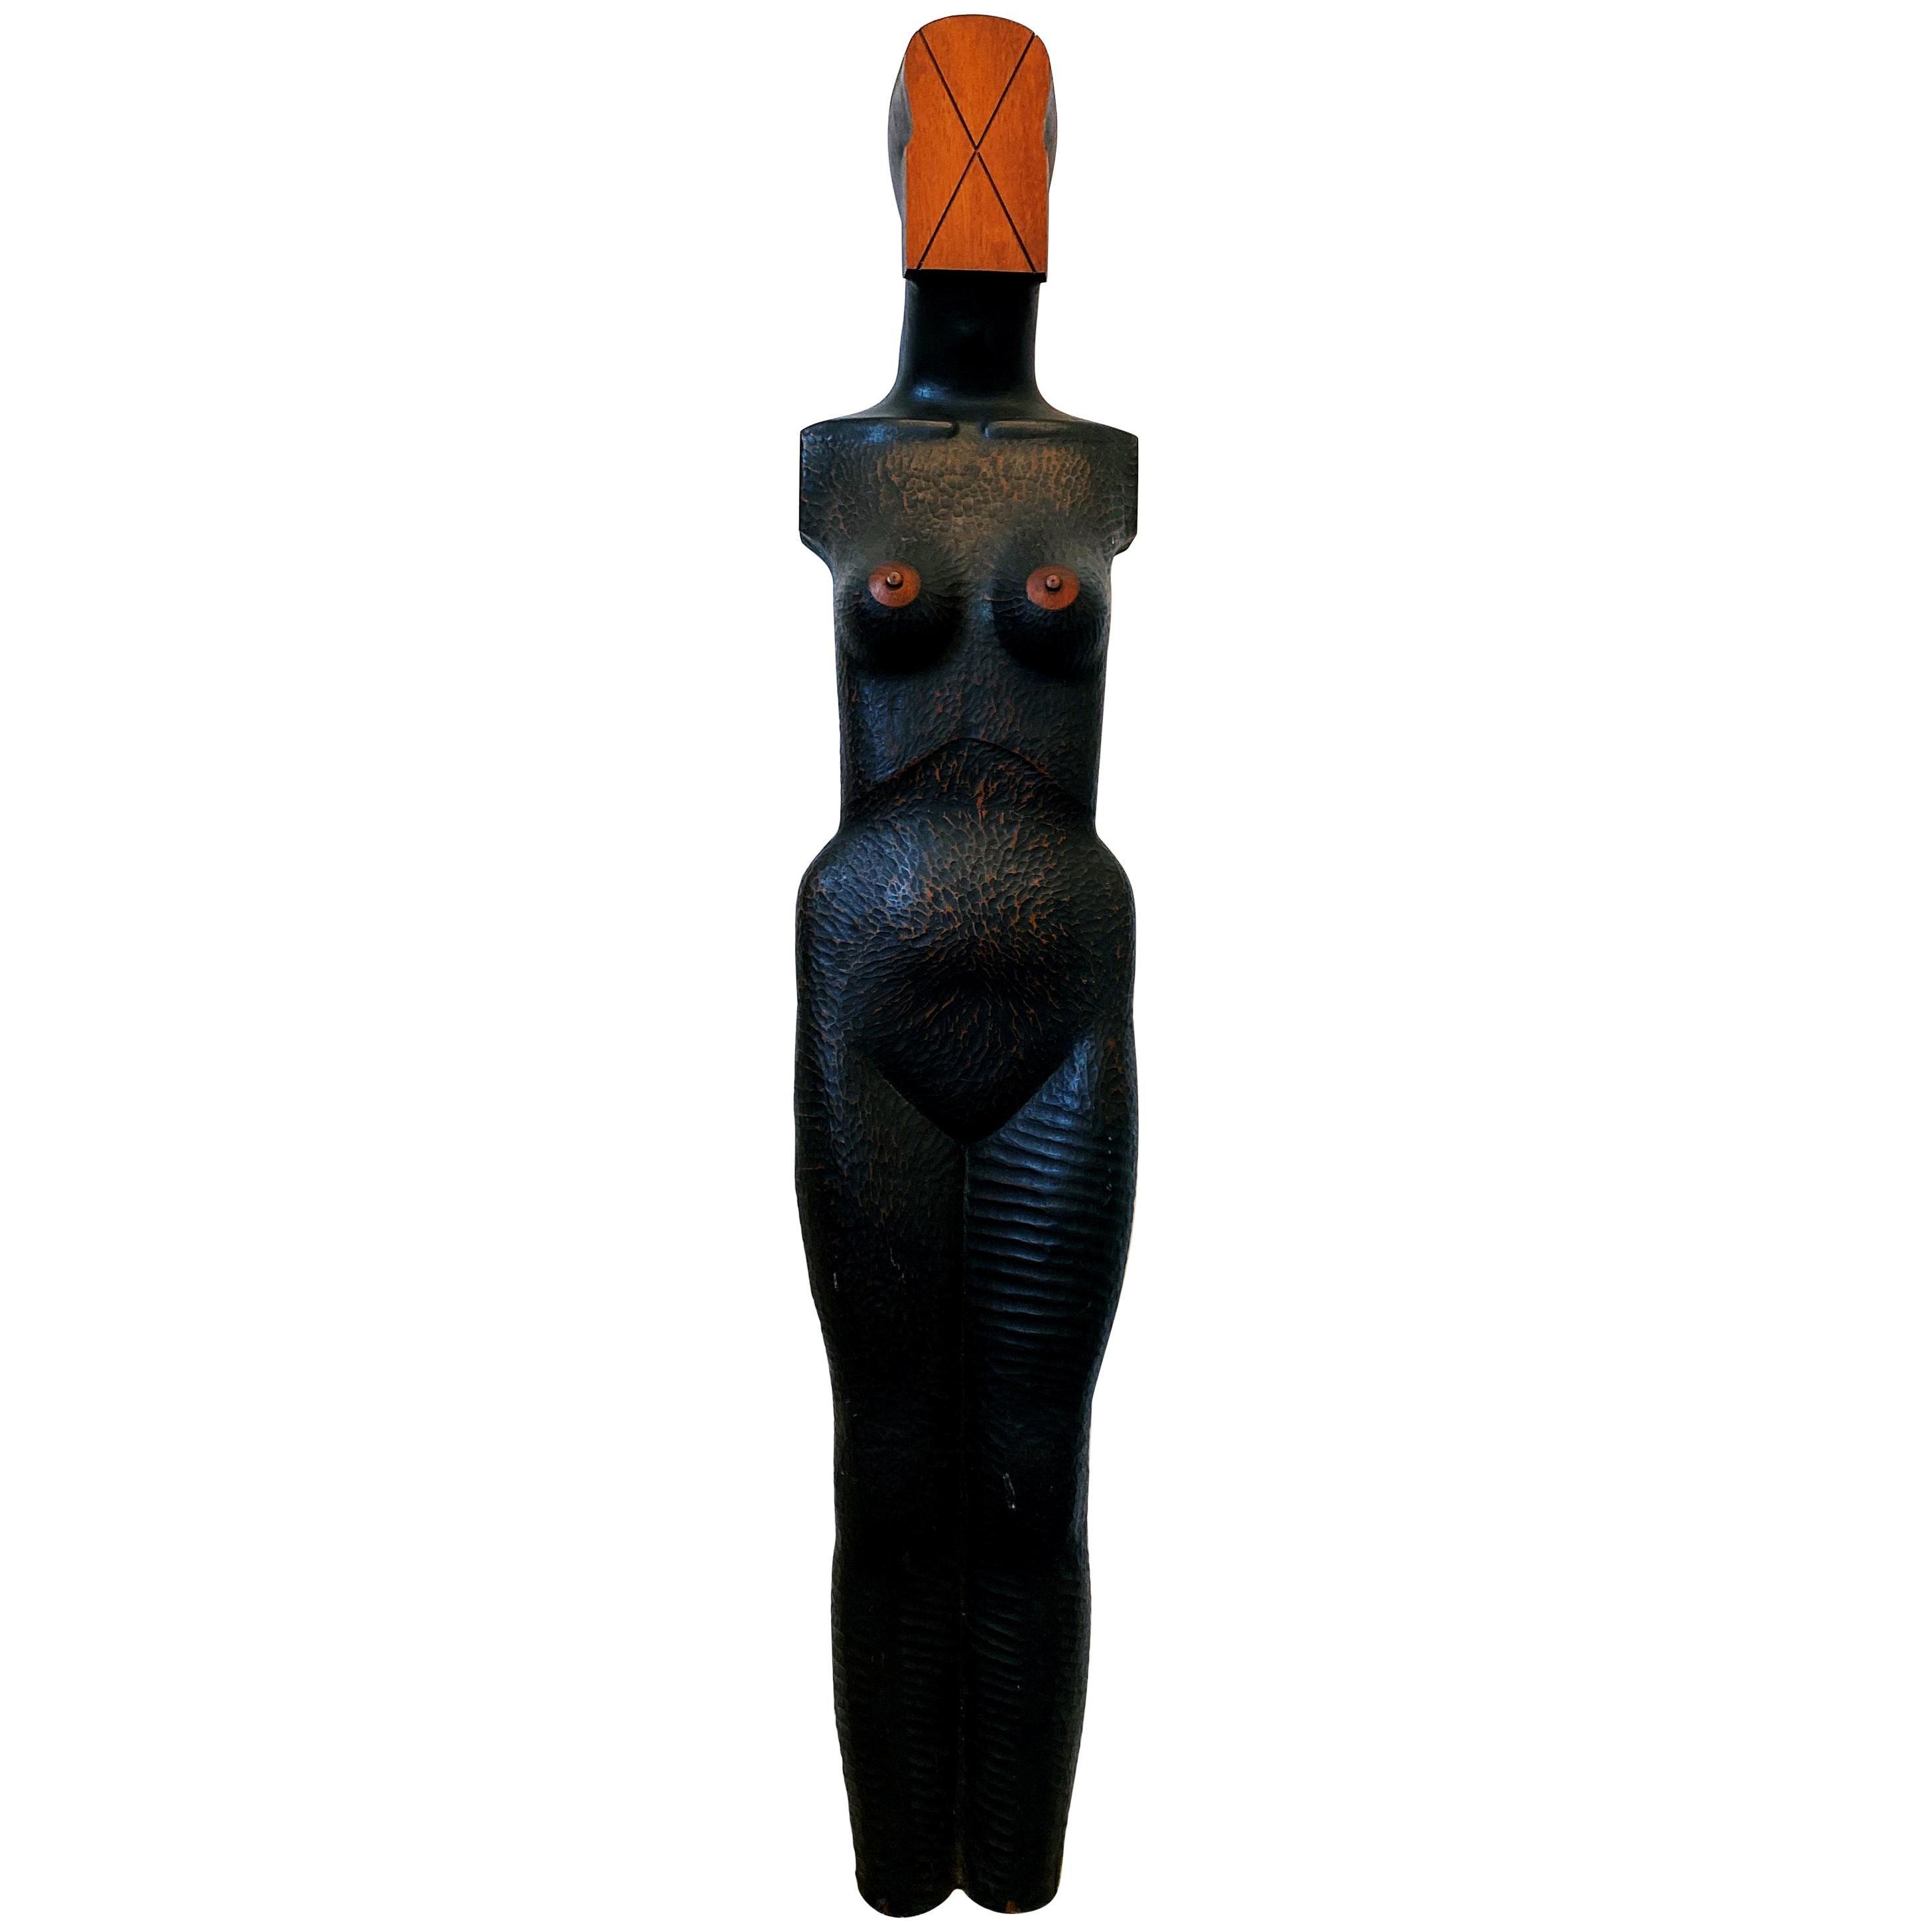 Vintage 1980s Jim Pruitt Hand Carved Mahogany Female Figurative Large Sculpture